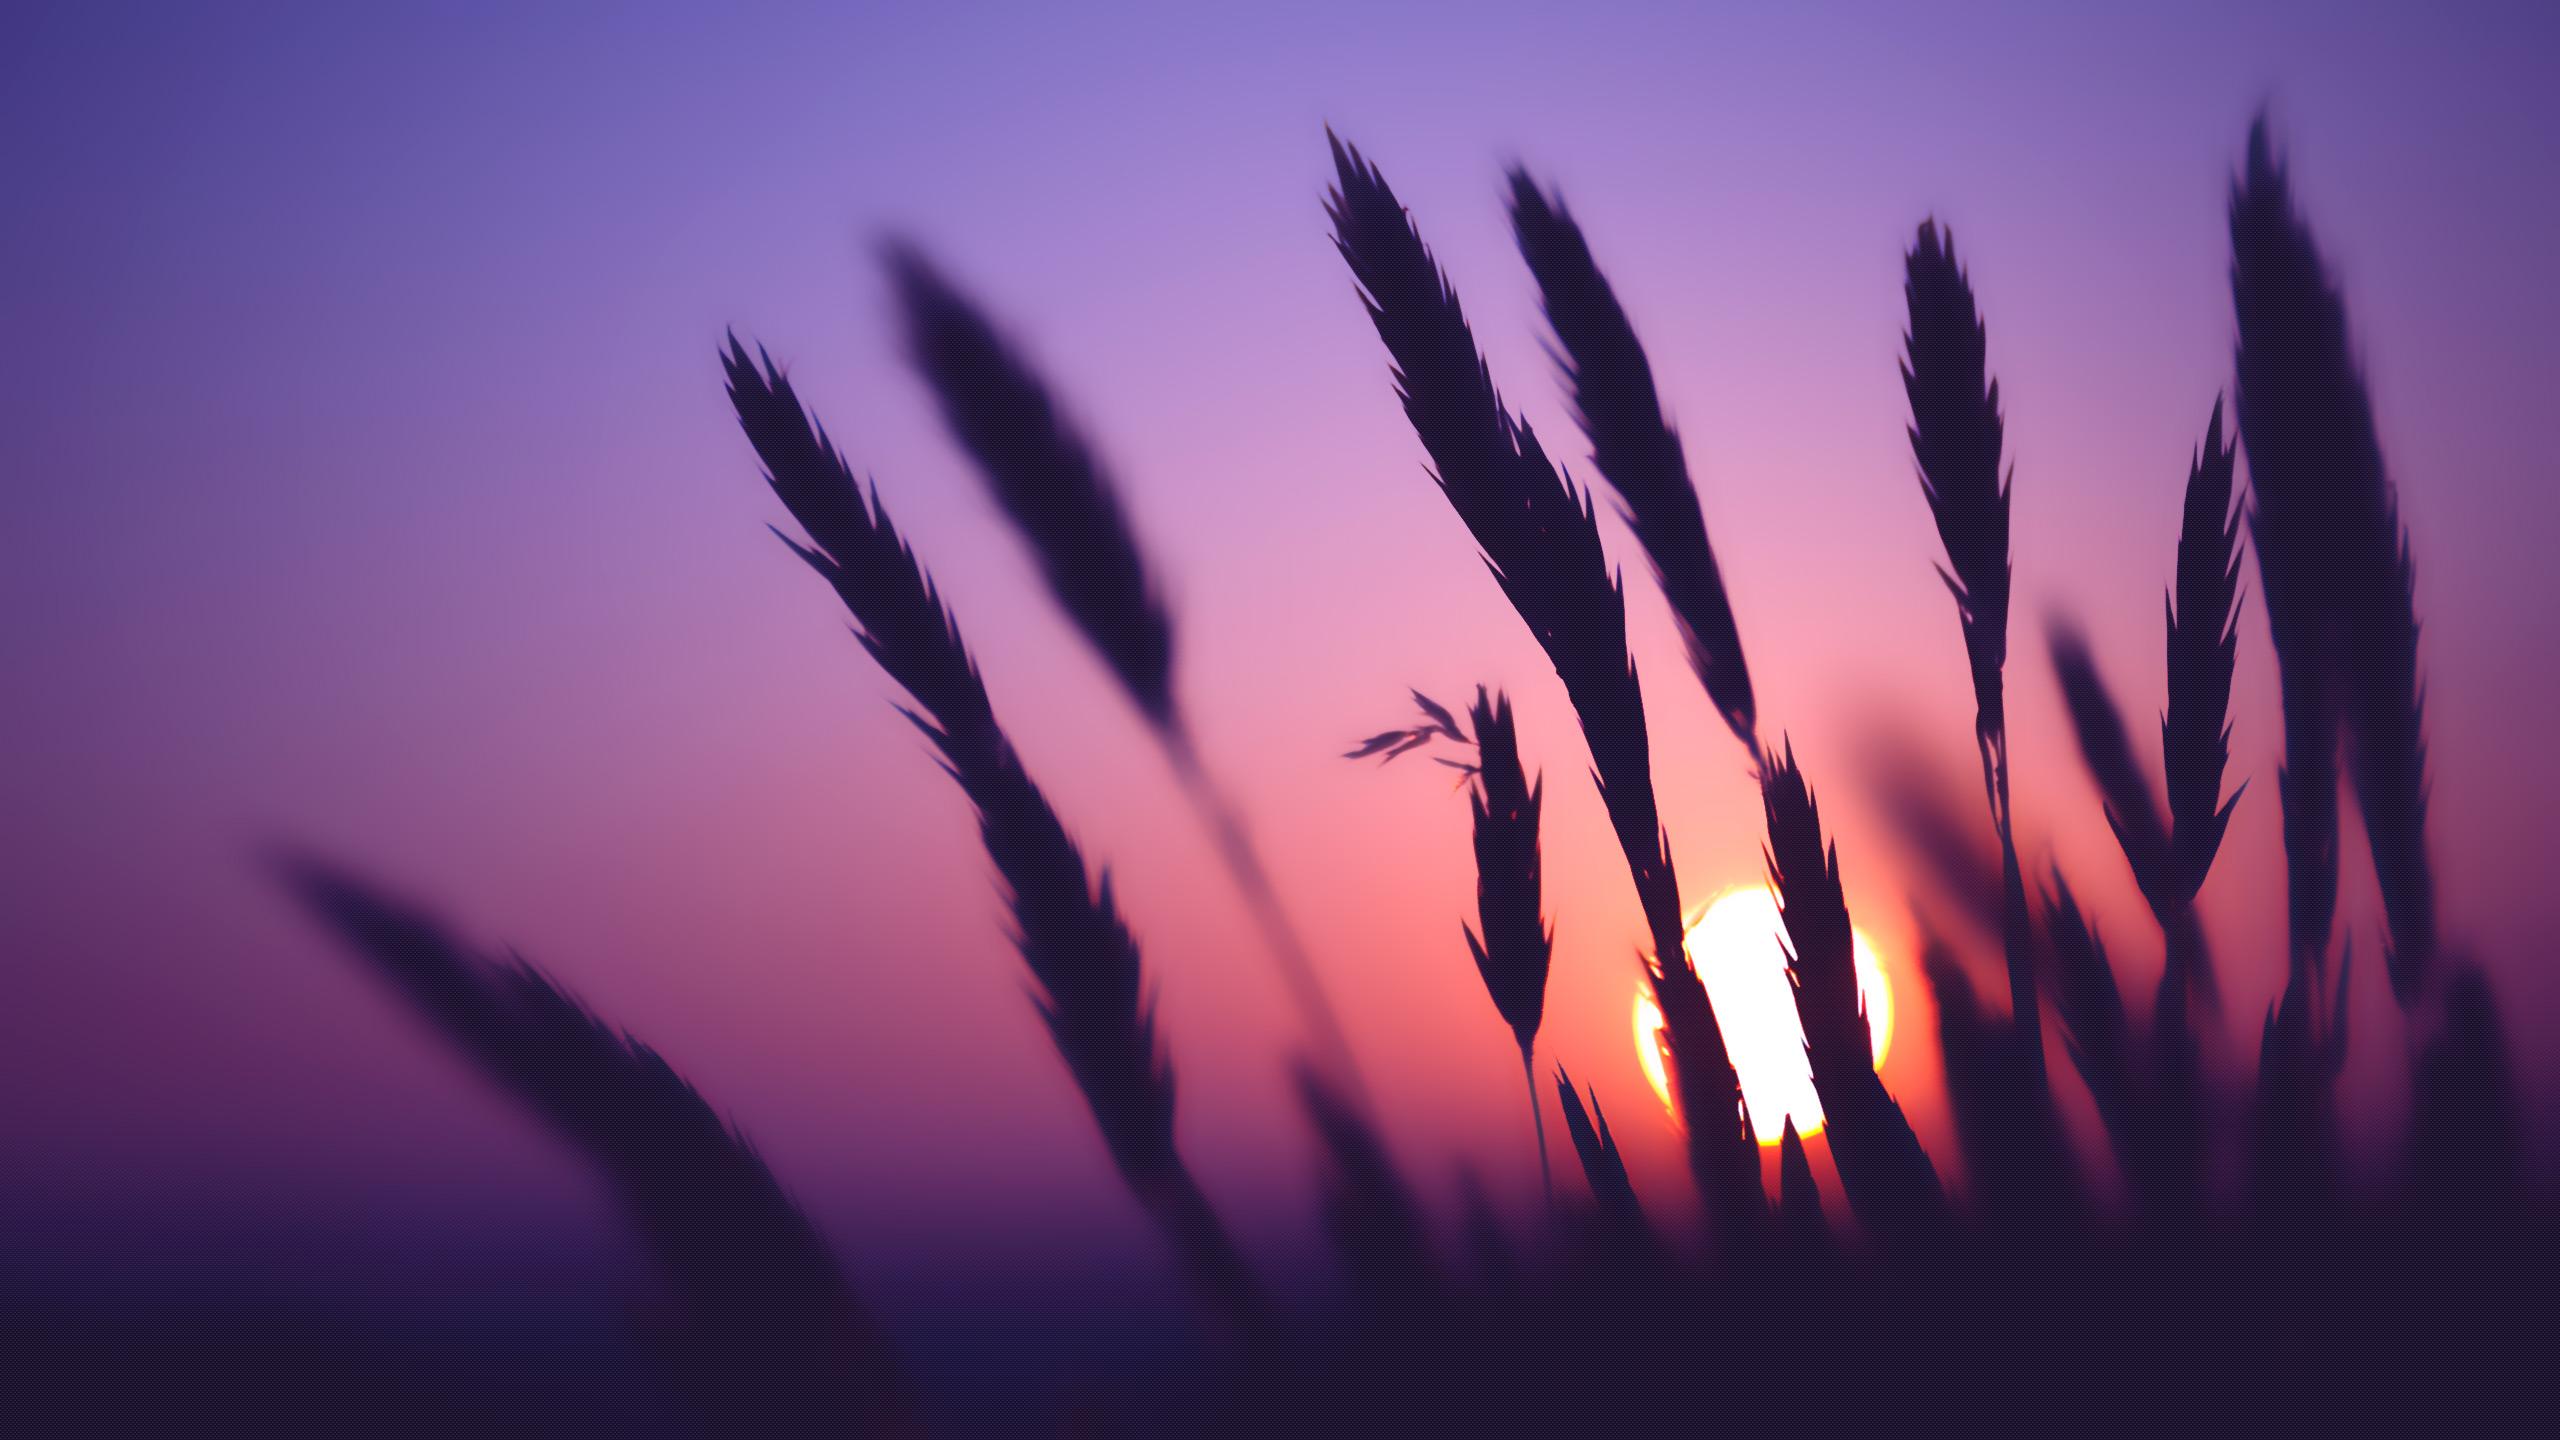 More Nature Desktop Wallpapers Purple Sunset Background Hd 1289806 Hd Wallpaper Backgrounds Download